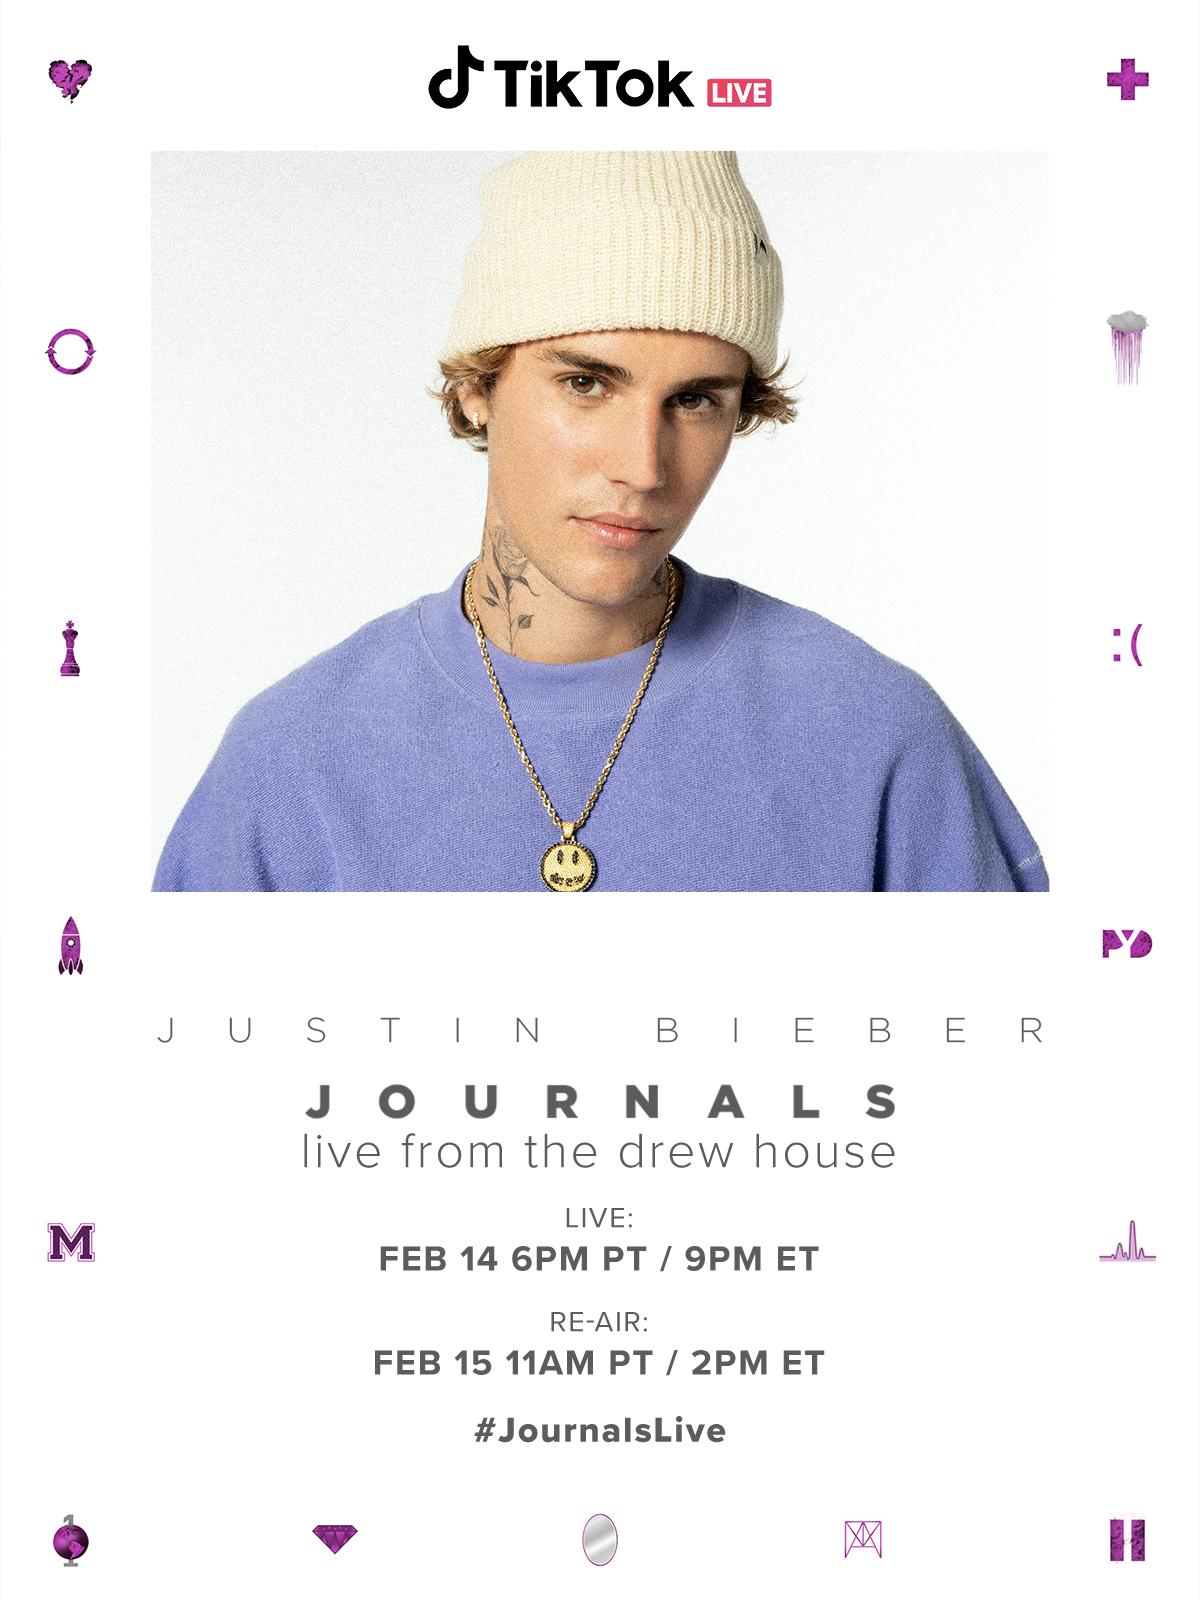 A Valentine S Day Gift From Justin Bieber Tiktok Journalslive Tiktok Newsroom